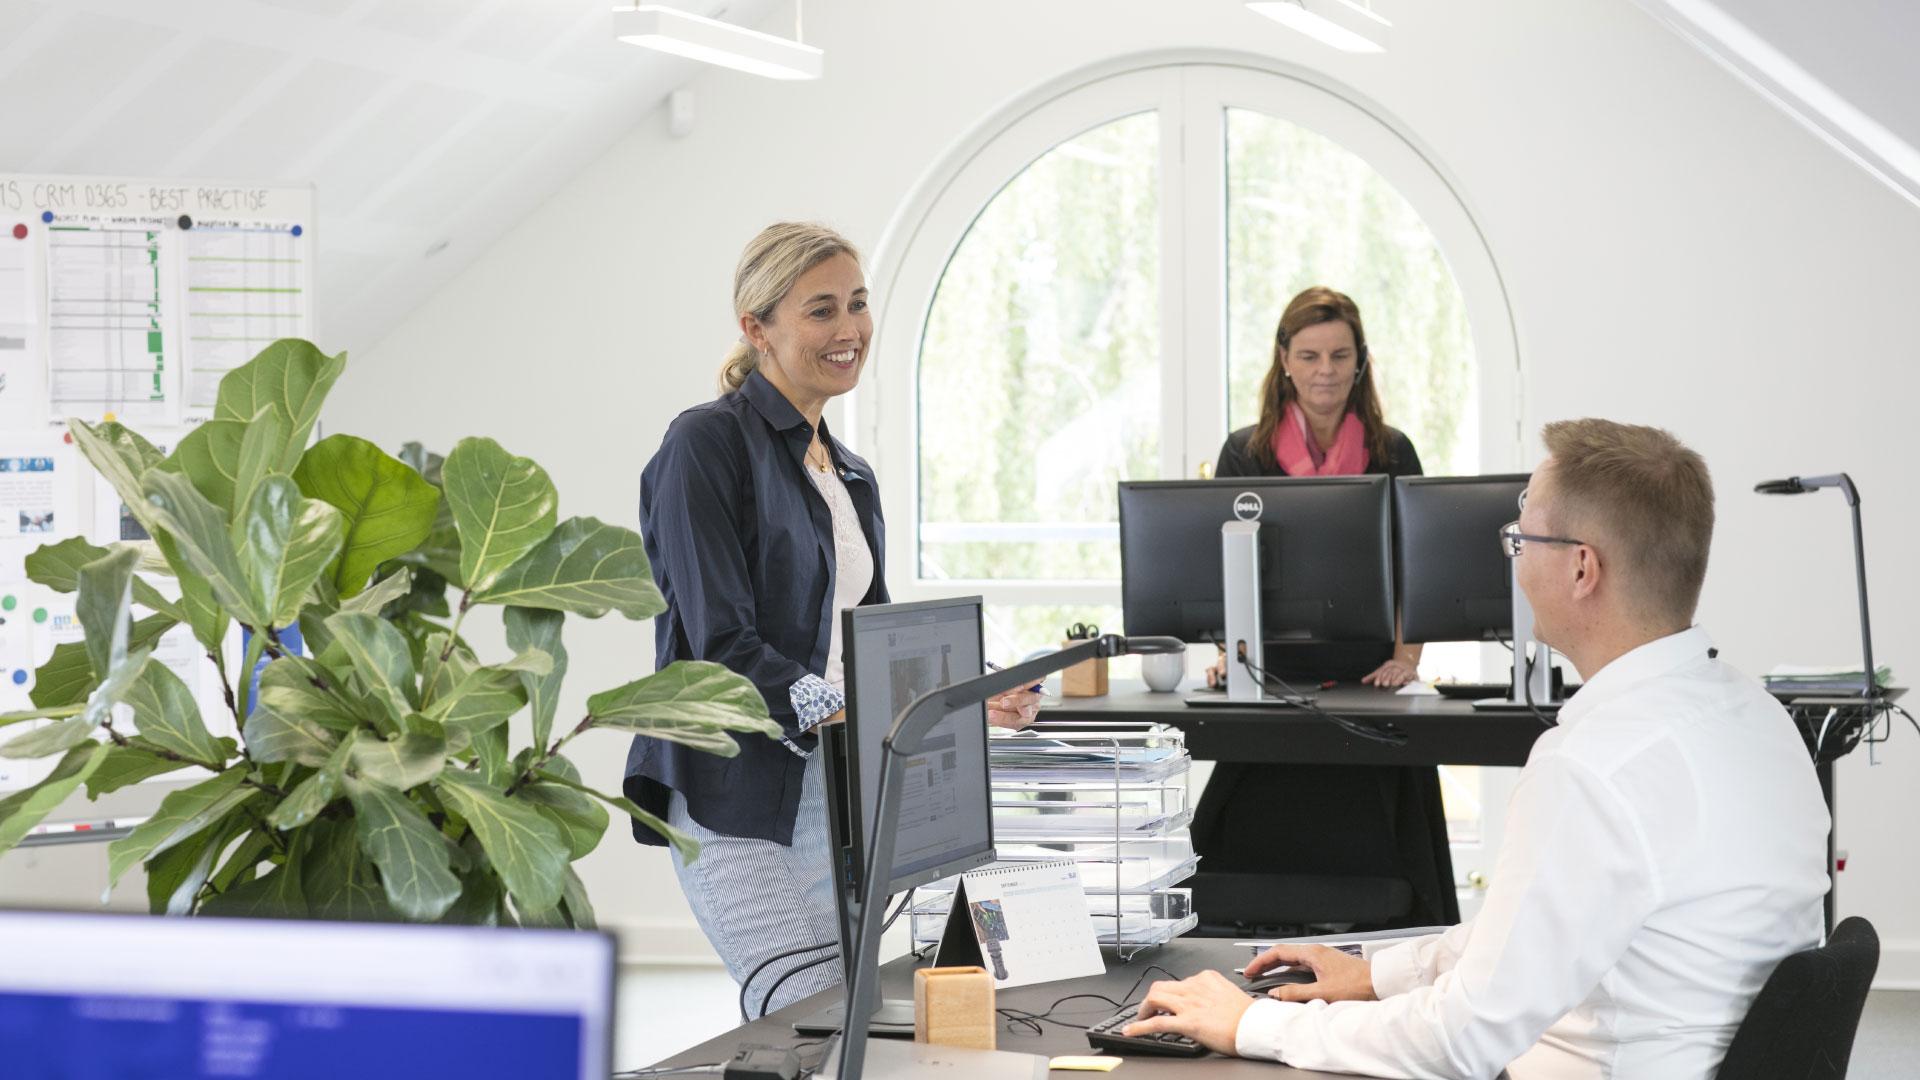 Office environment at AVK in Denmark